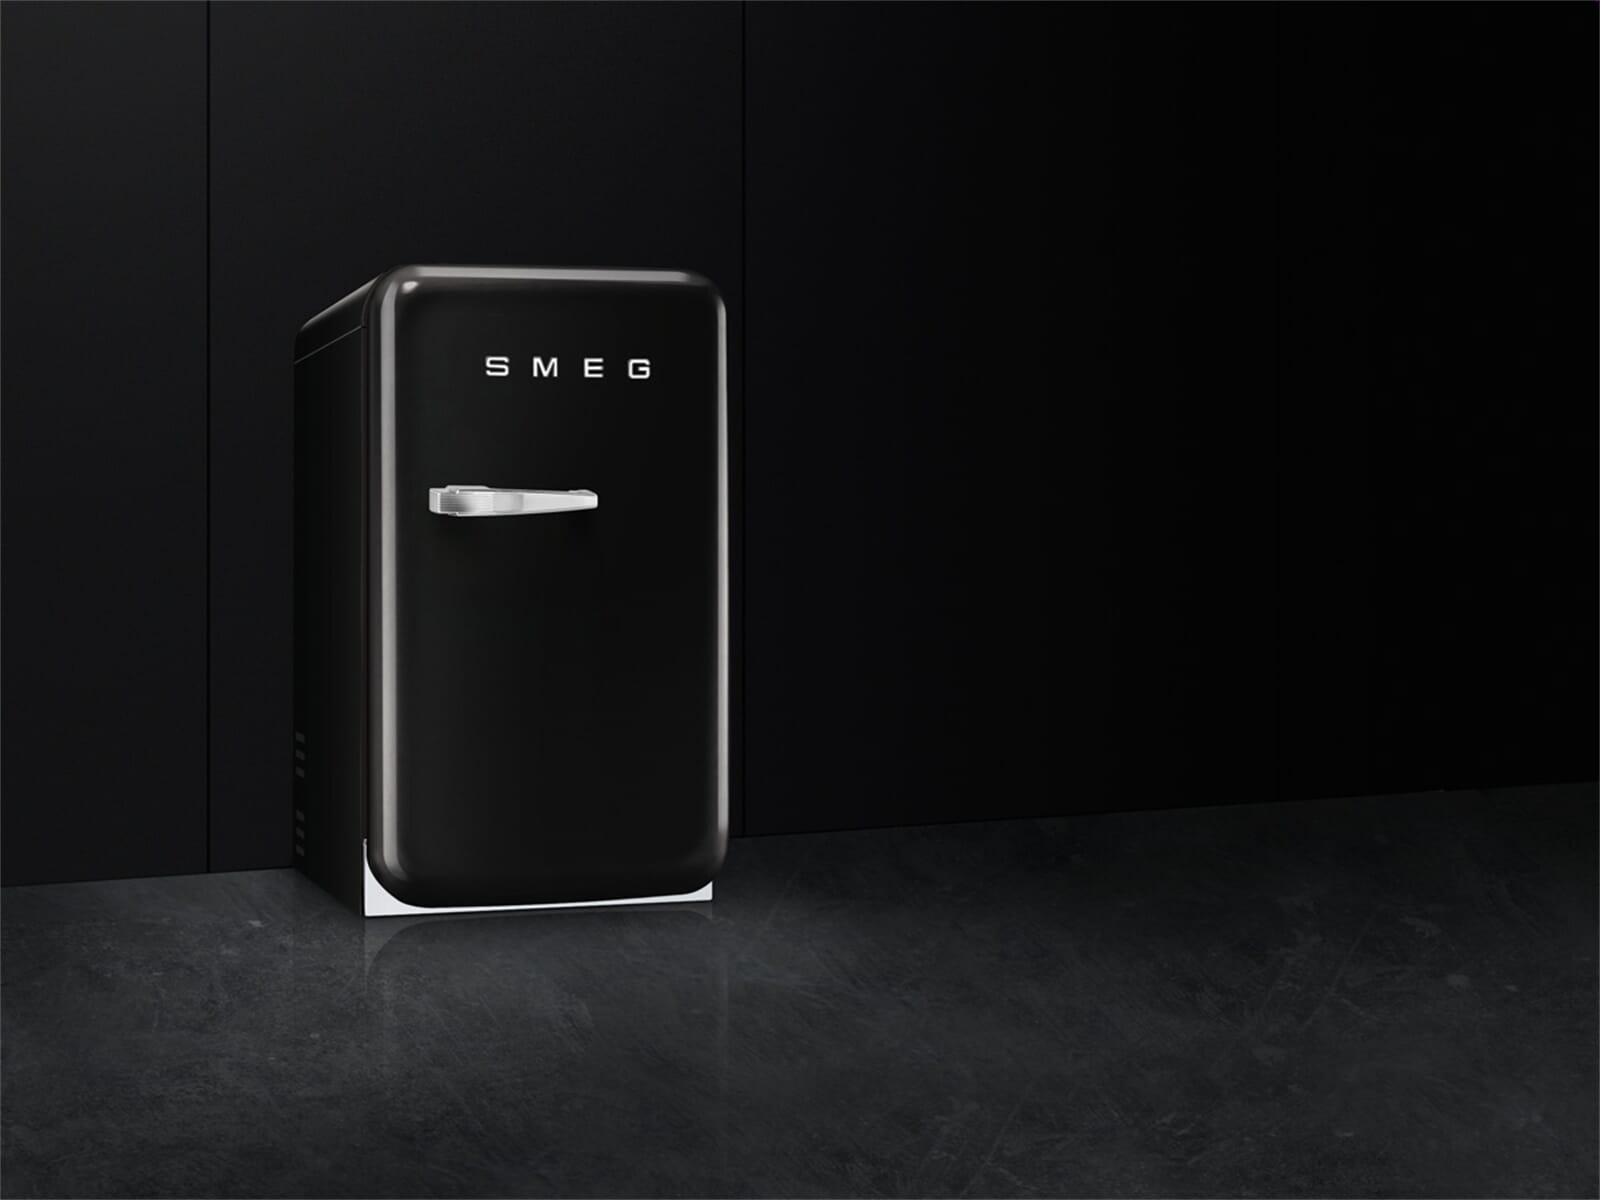 Smeg Kühlschrank Schwarz Gebraucht : Smeg fab5rbl standkühlschrank schwarz